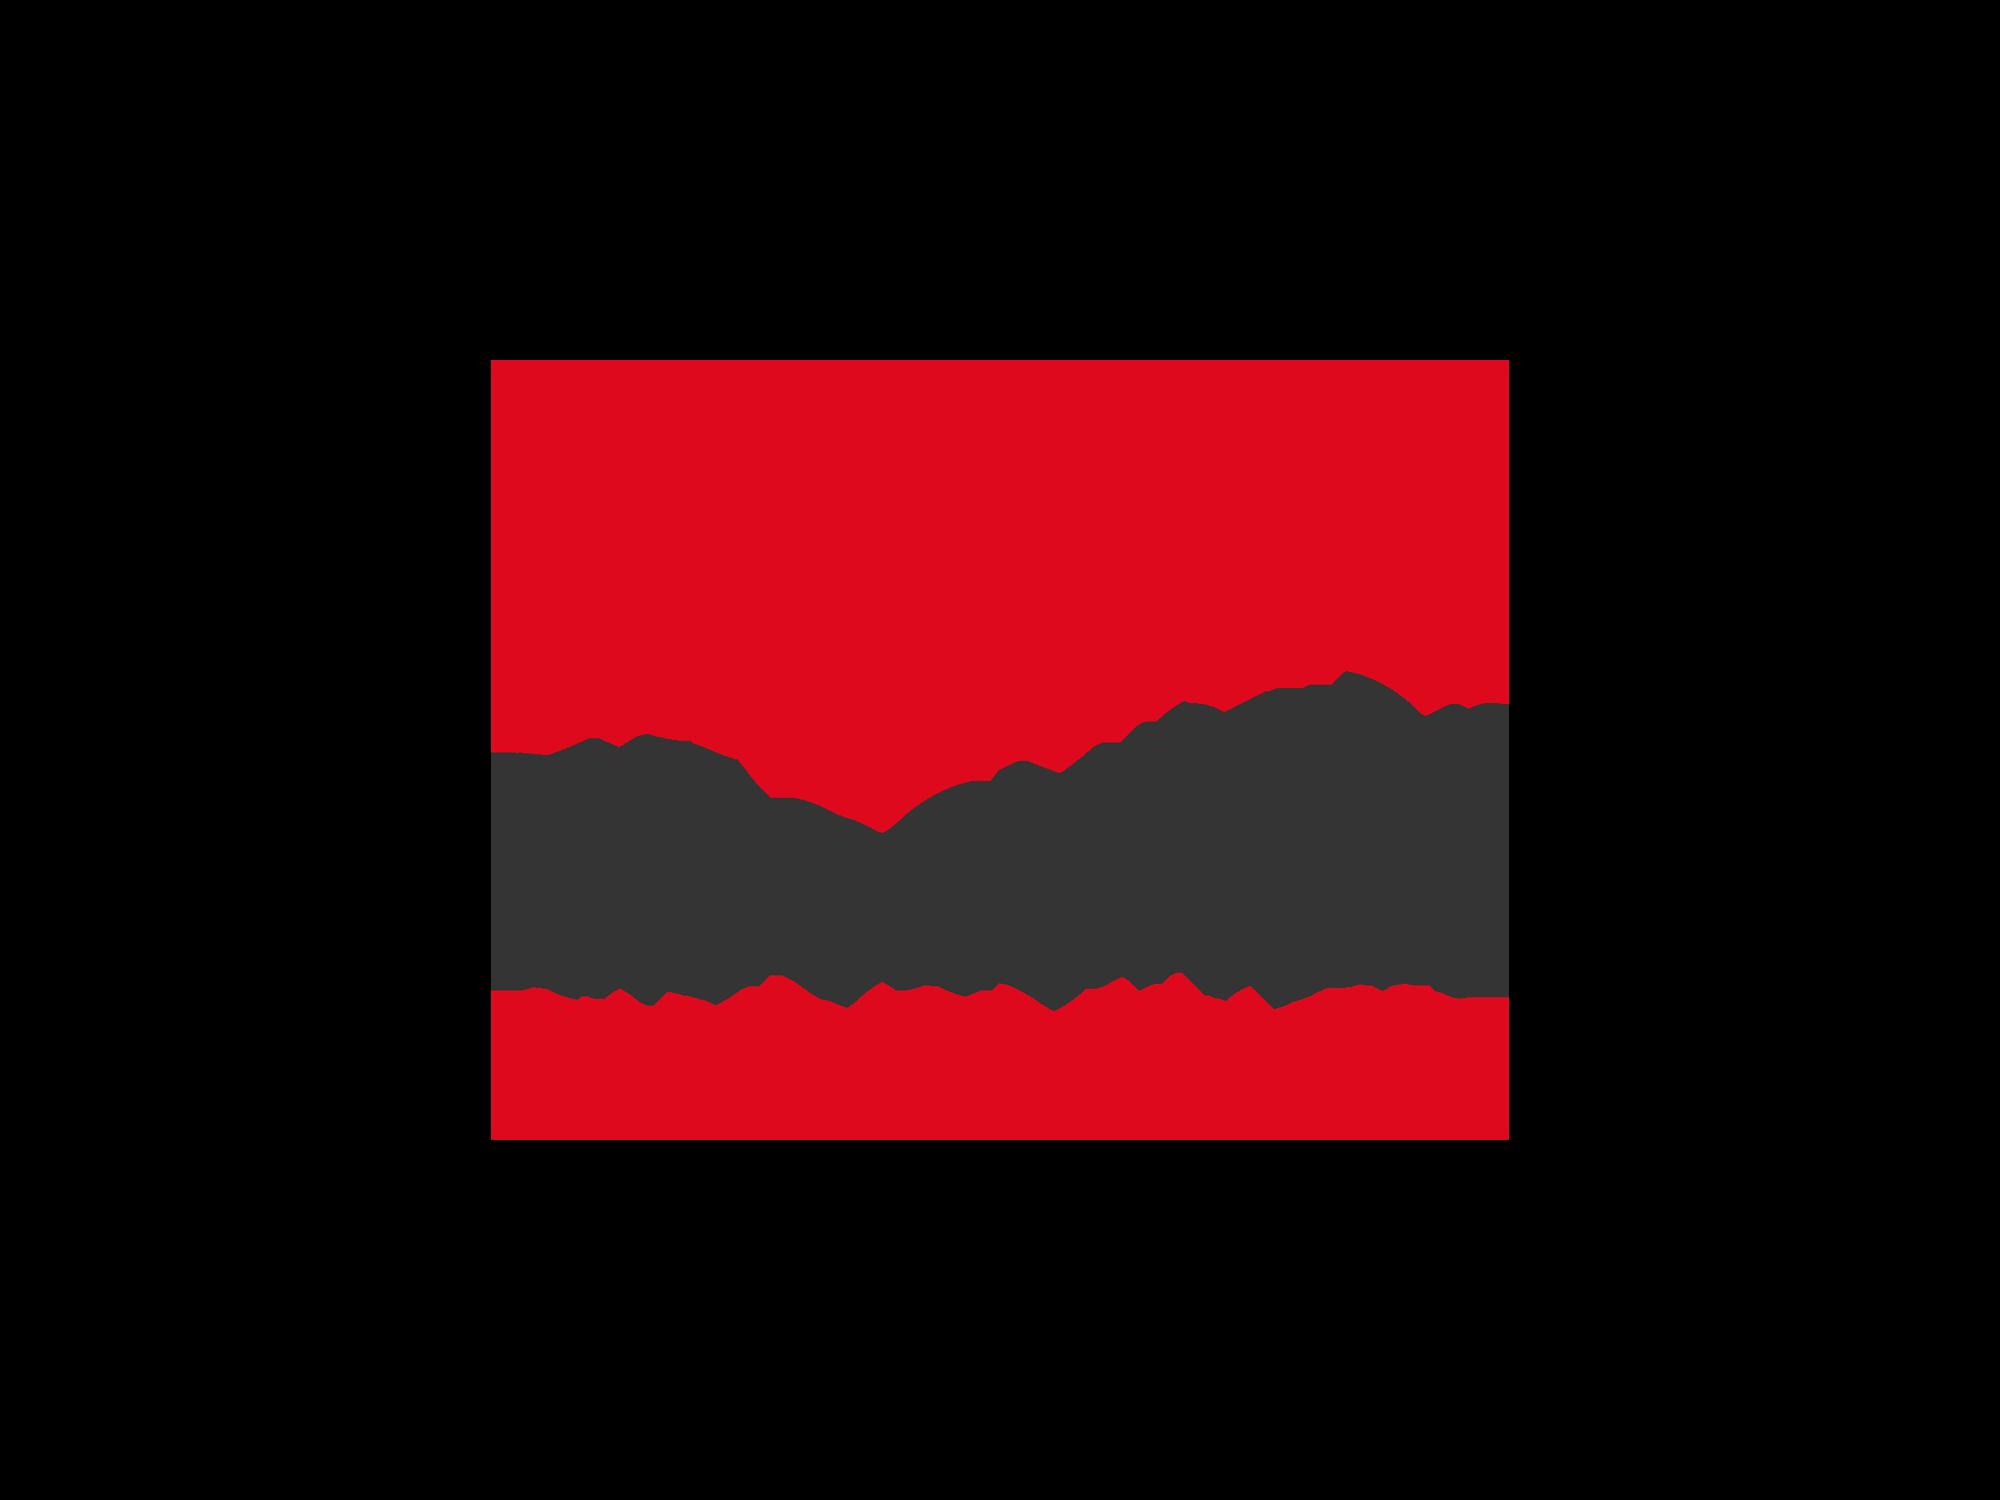 apodiscounter logo edit 03